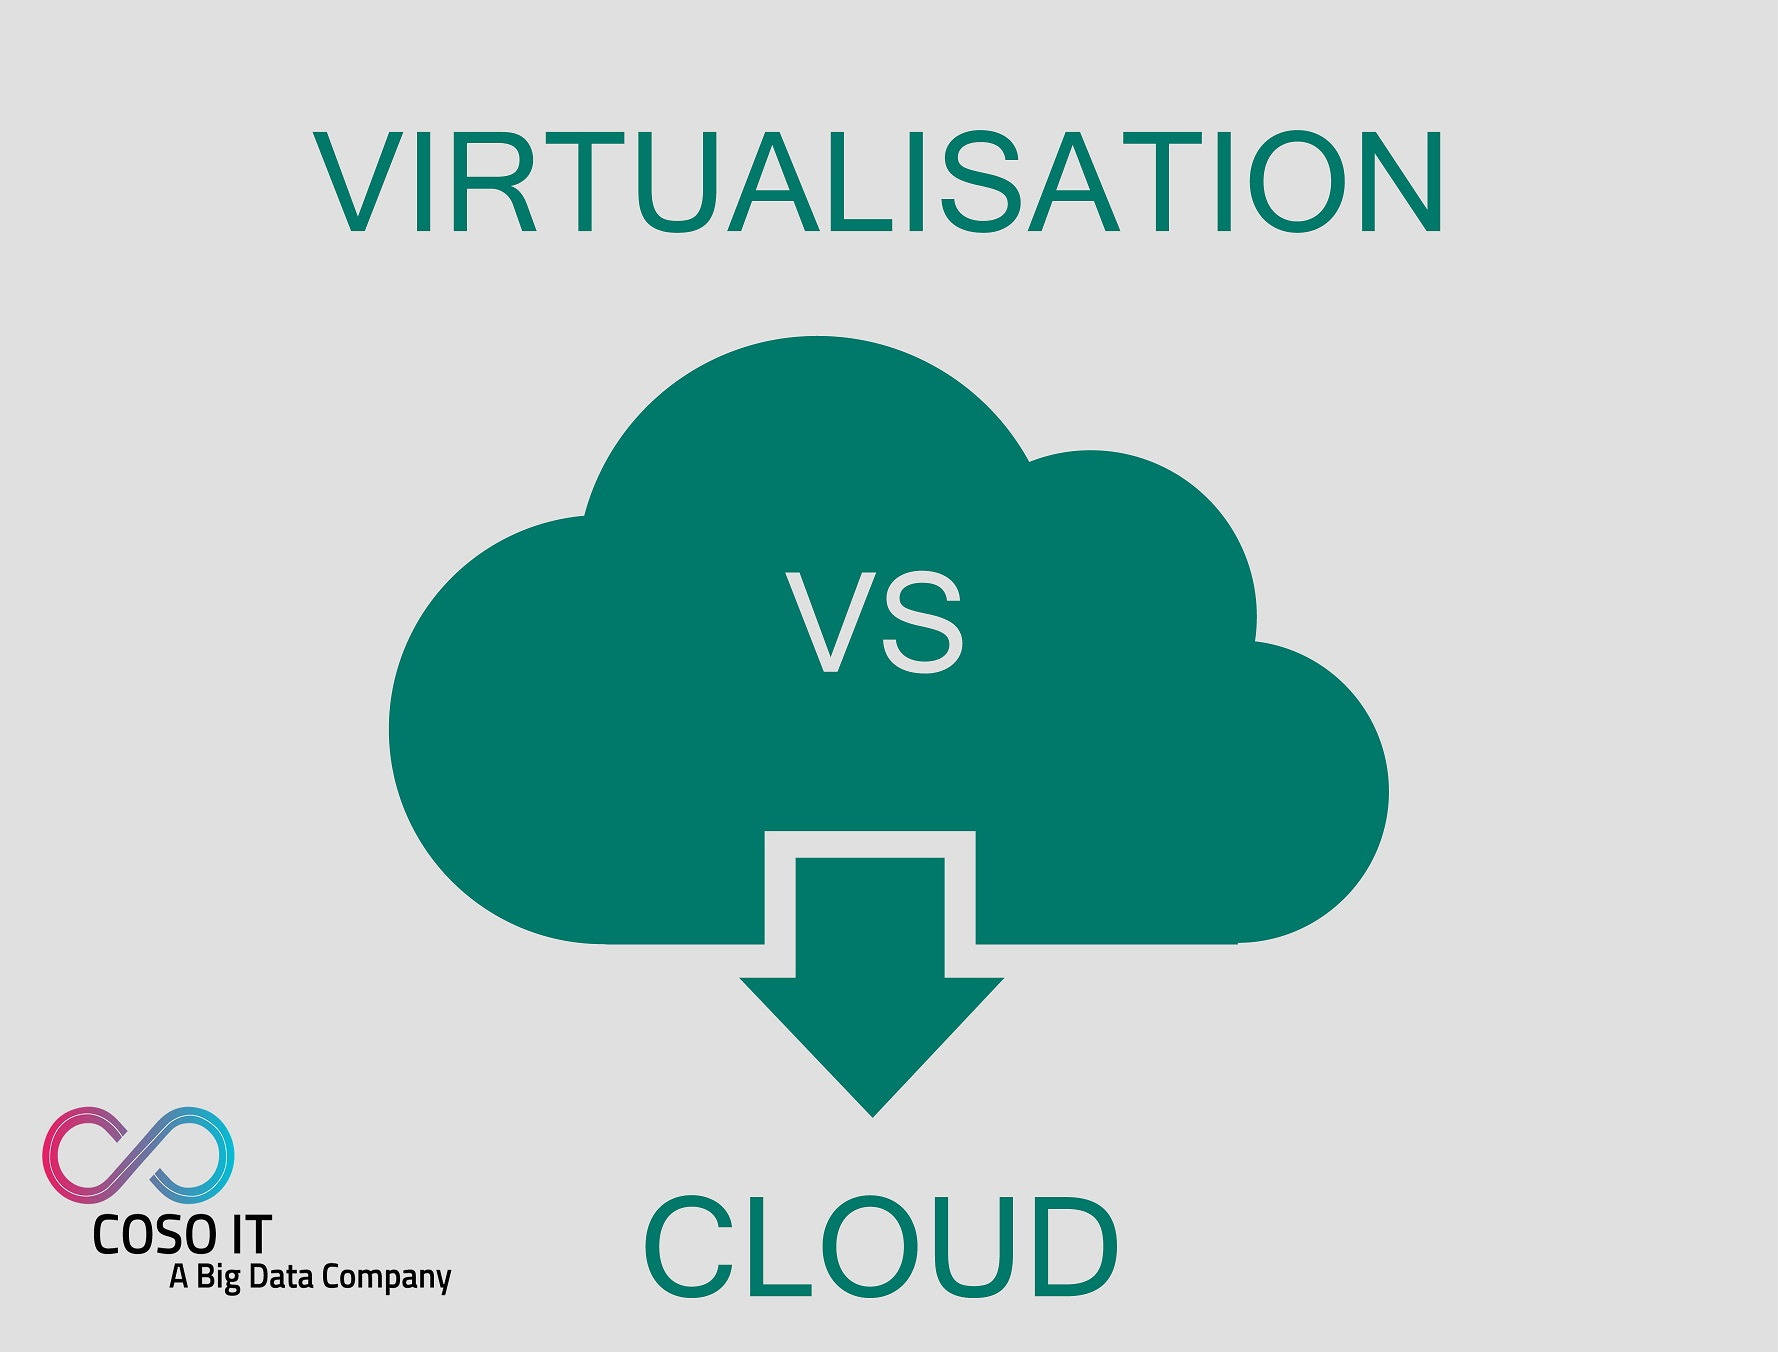 Advantages of Virtual Environment over cloud